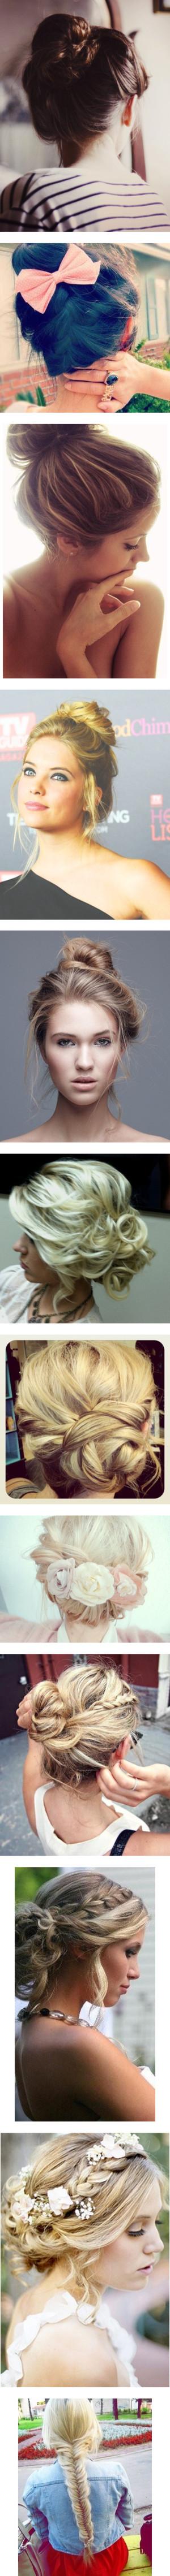 """Hair"" by pinkesgummibaerchen ❤ liked on Polyvore"